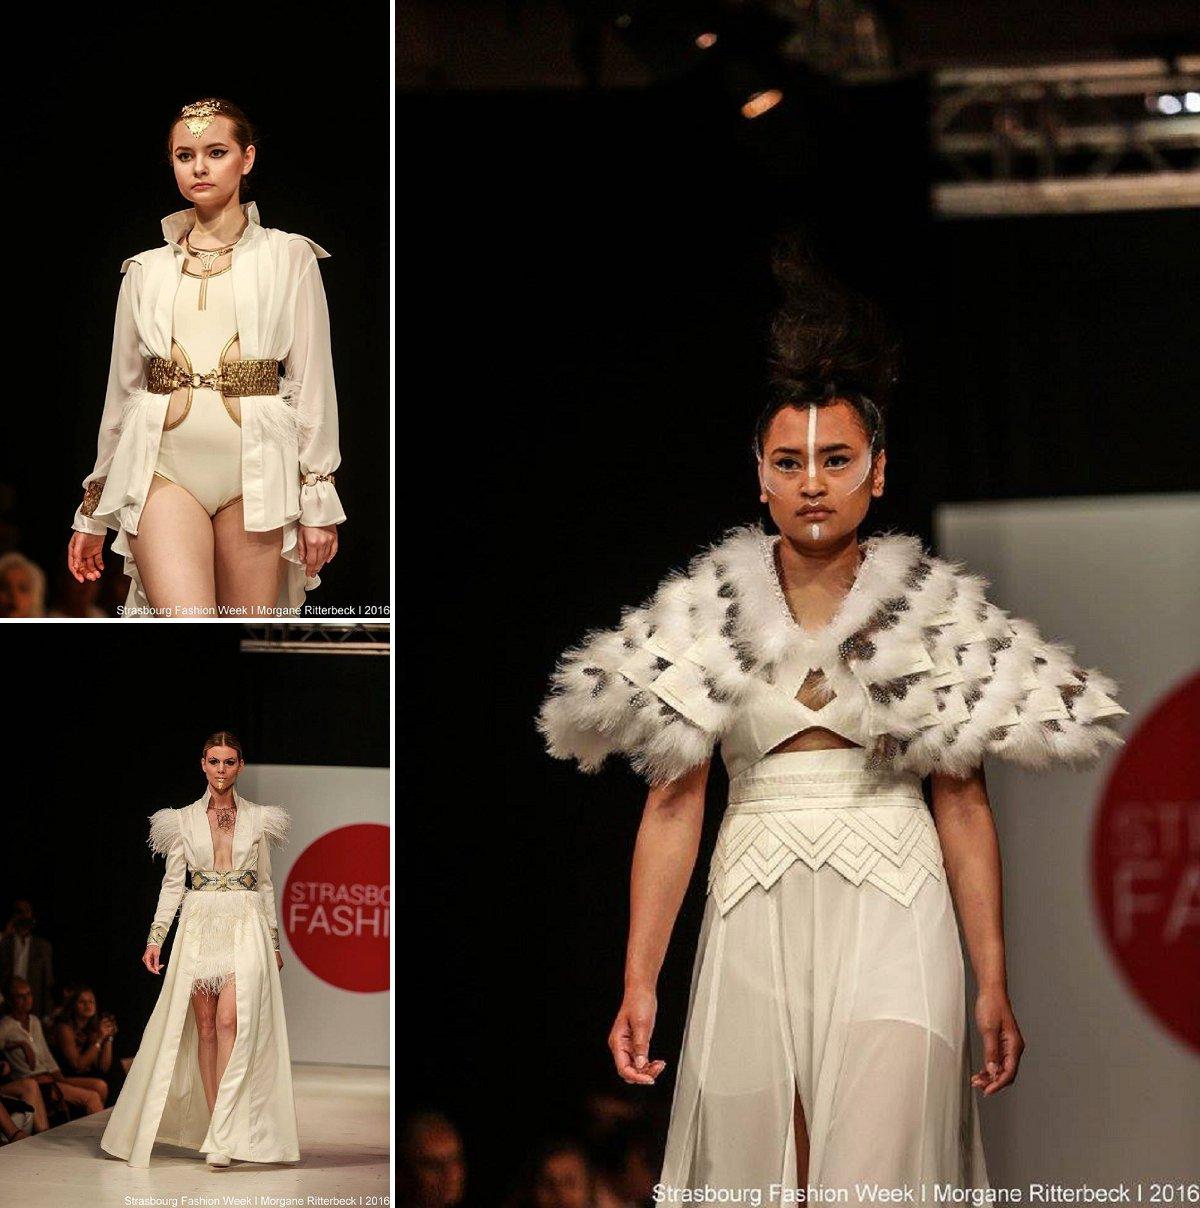 Défilé couture Fashion Week Strasbourg